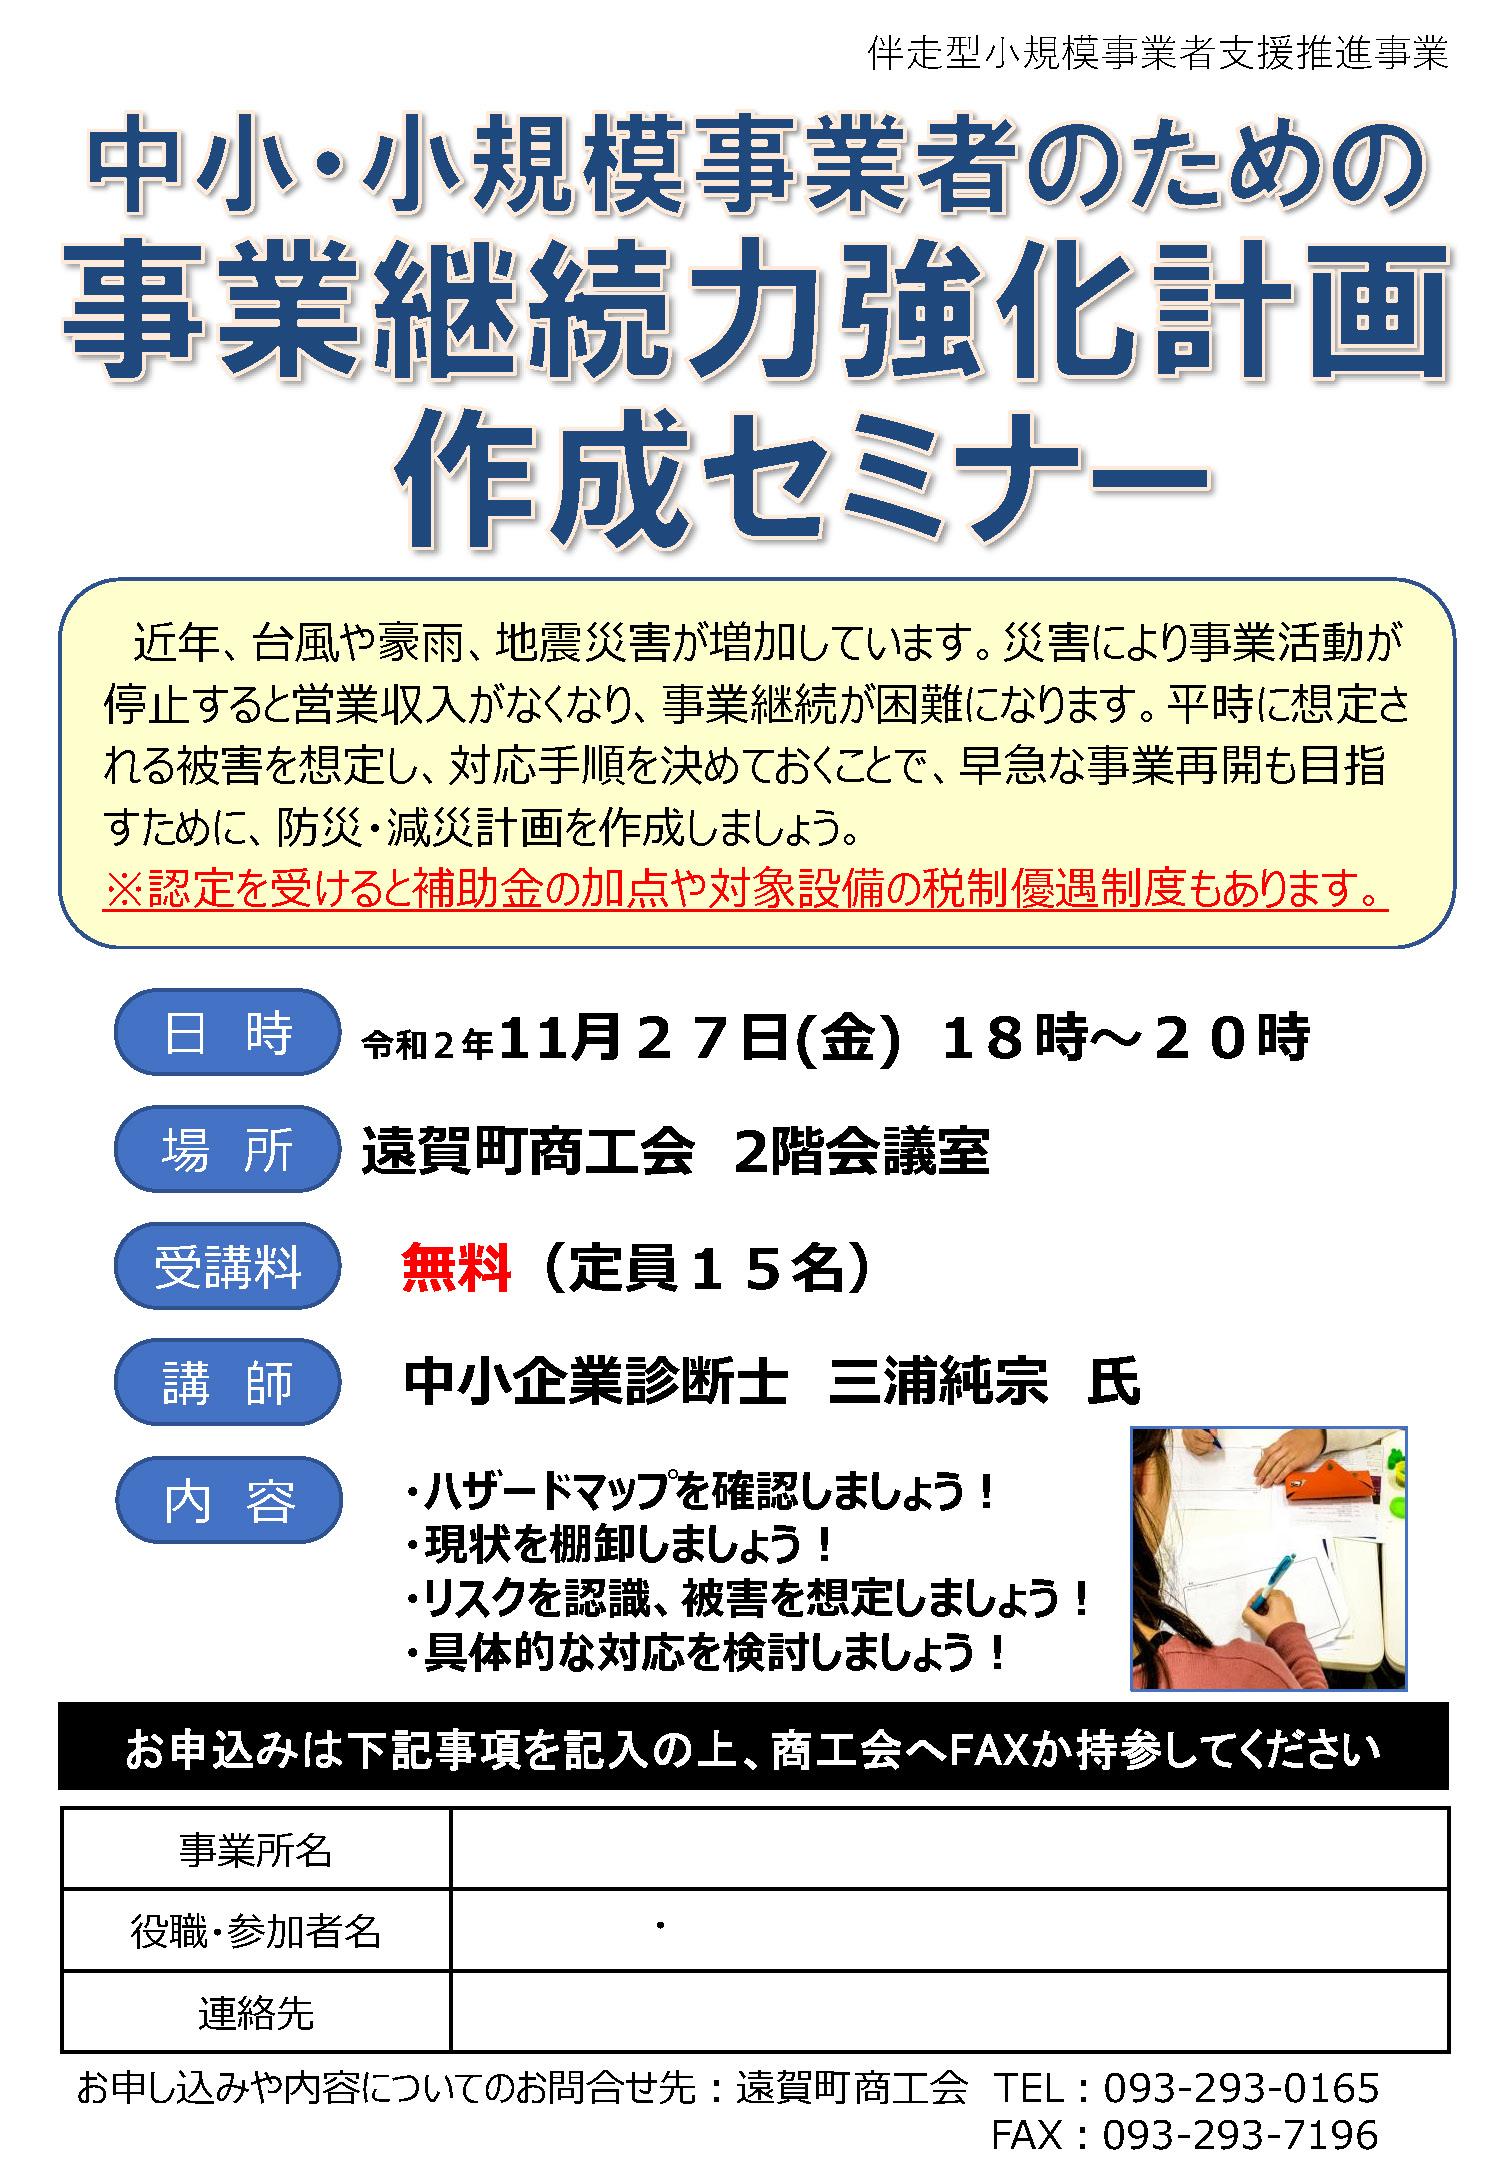 jigyoukeizoku-seminar